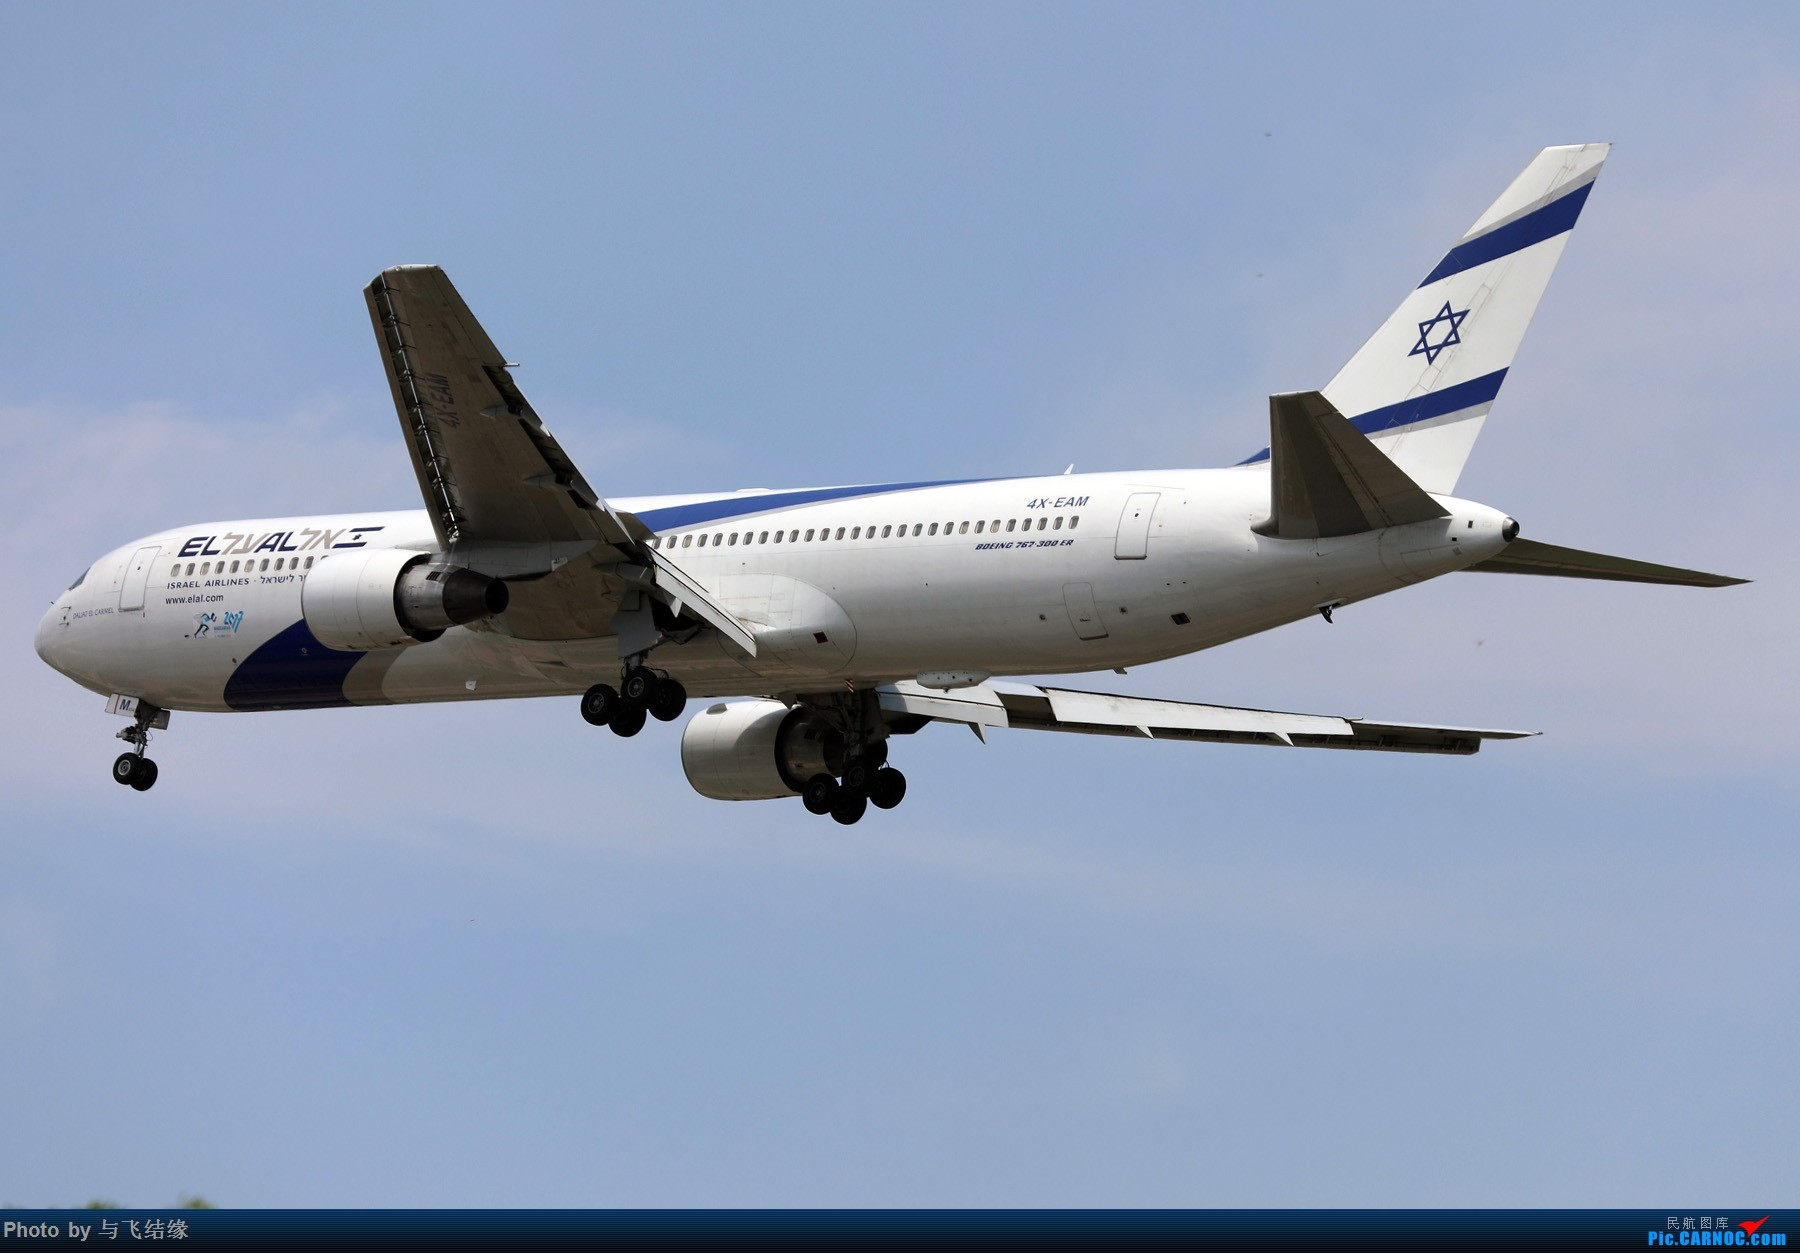 Re:以色列航空Boeing 767-300ER小彩绘及全日空Boeing 767-300ER